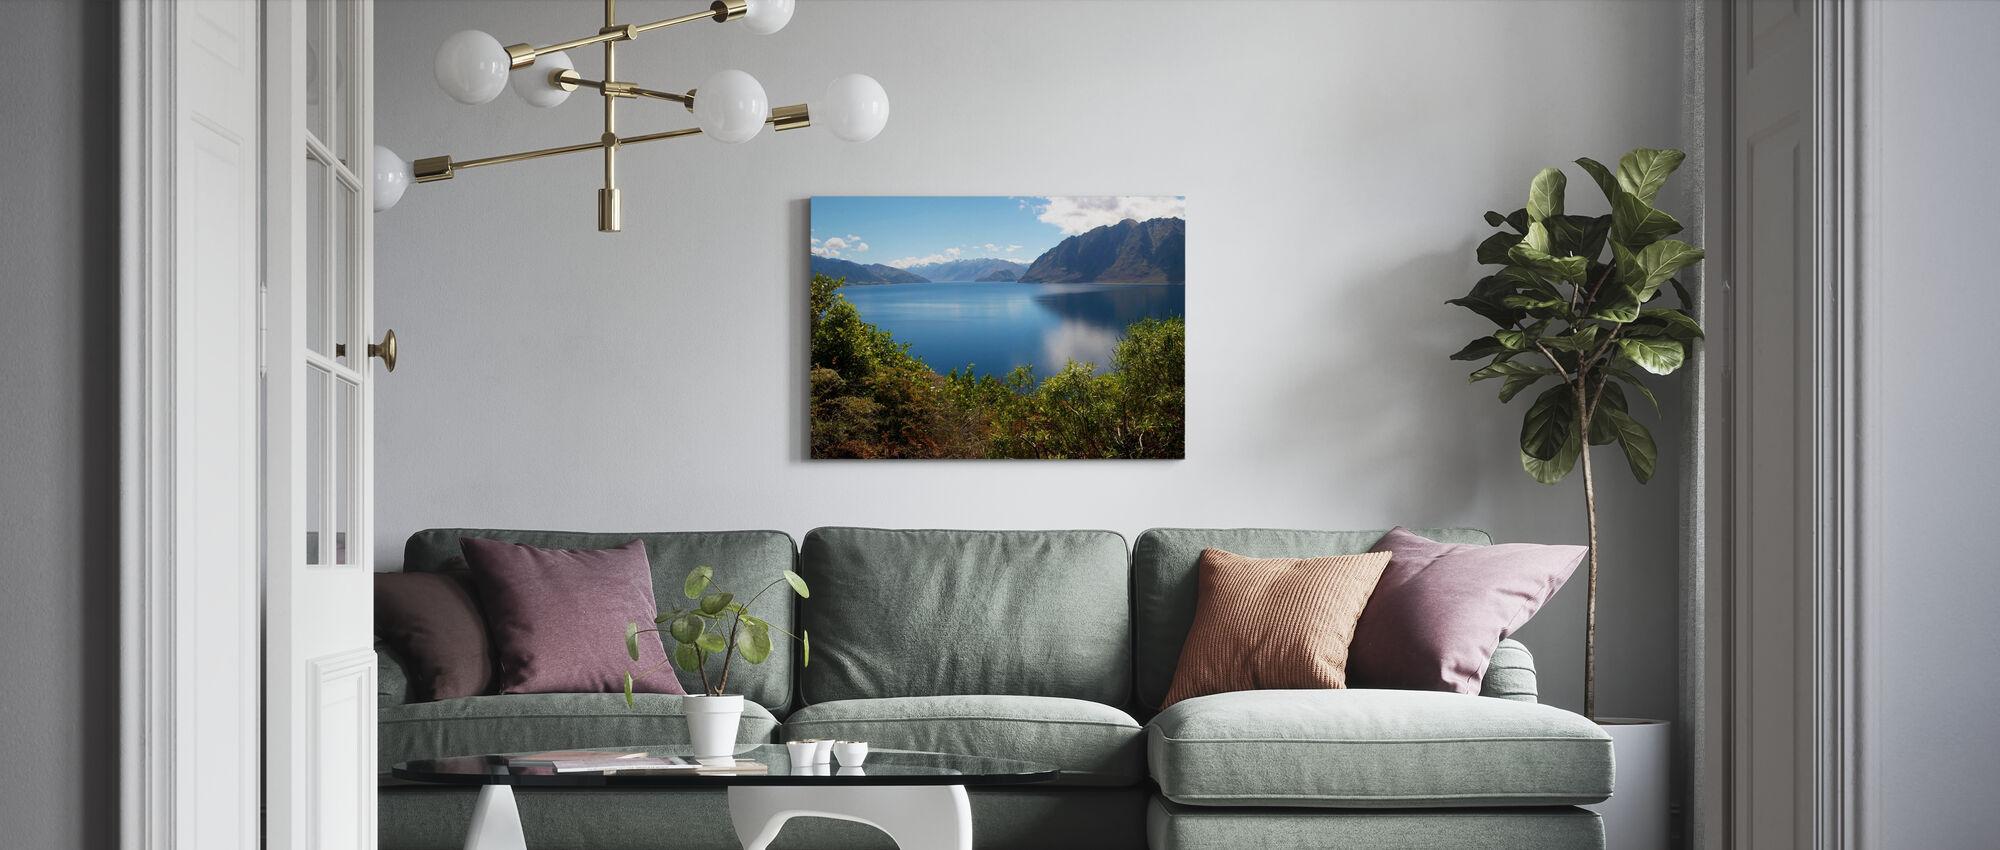 Nz Lake - Canvas print - Living Room